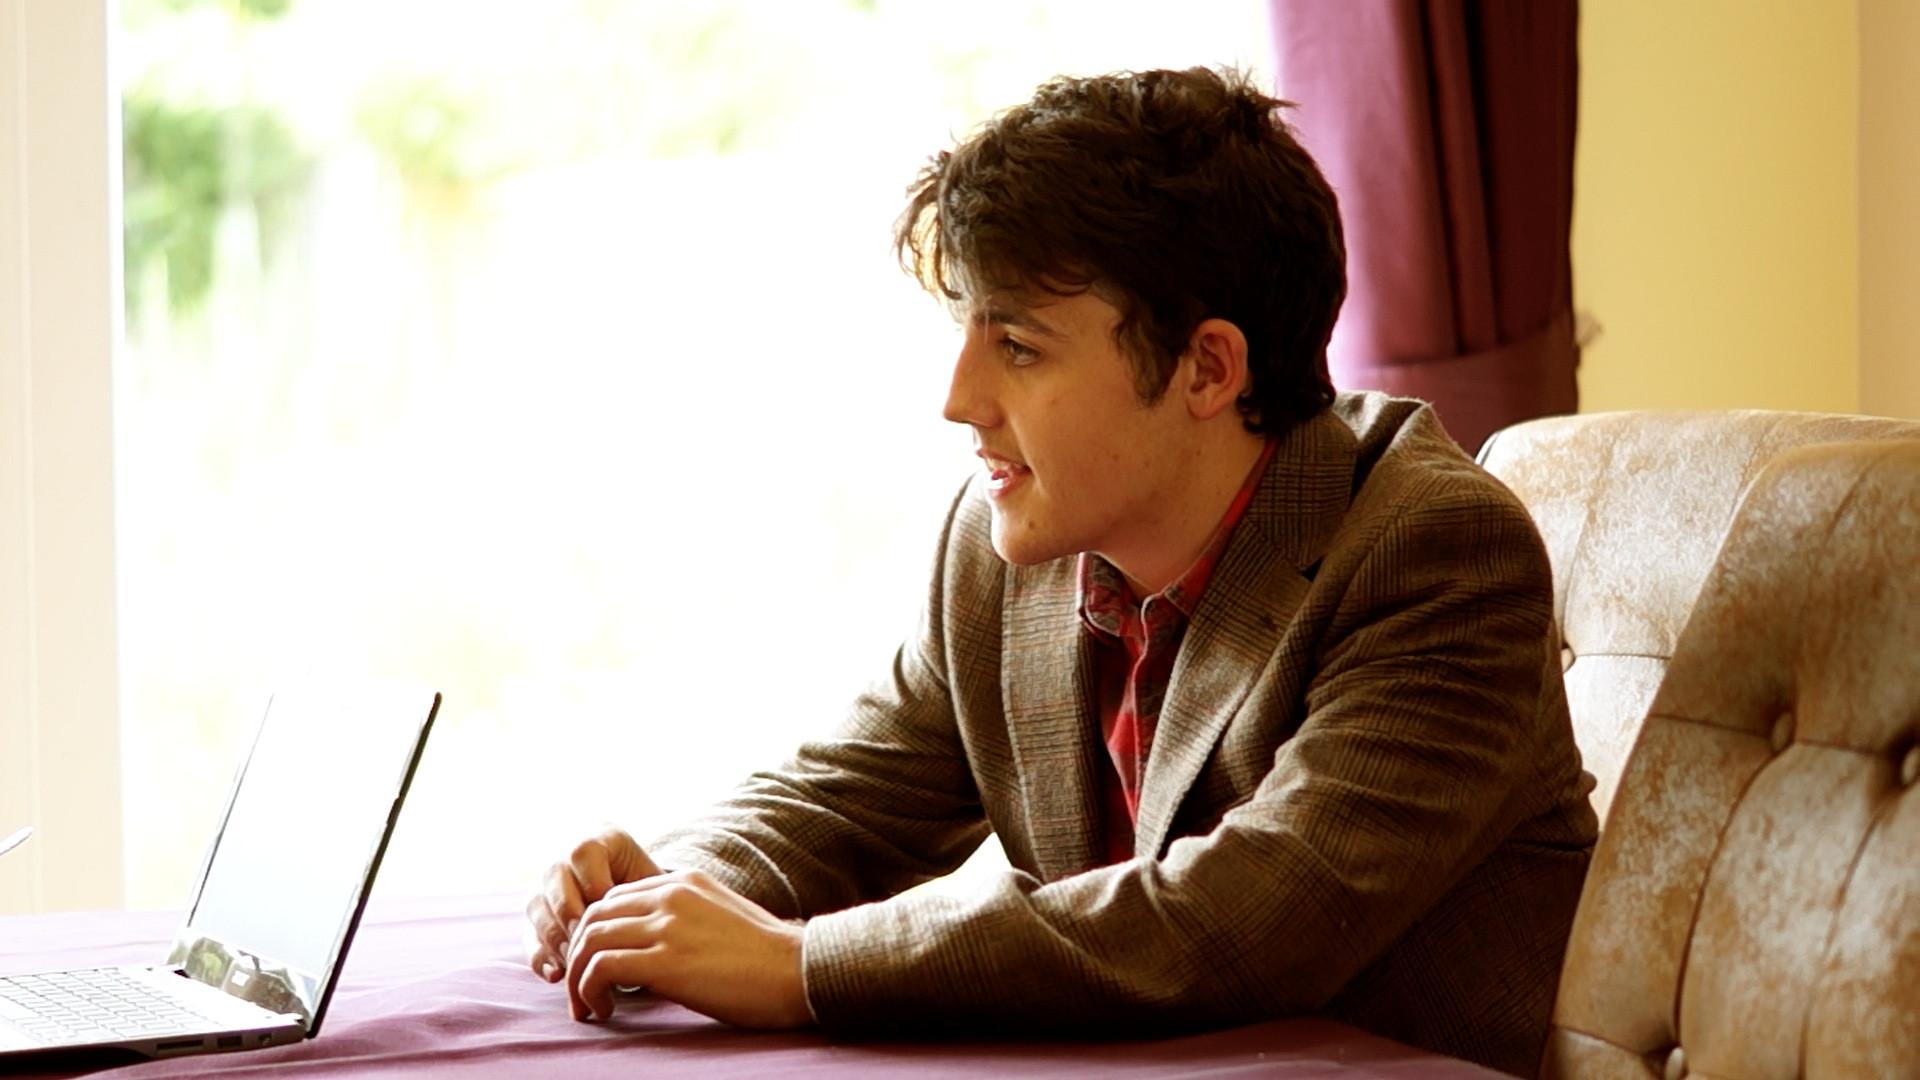 David Thompson as Emmett Shelby